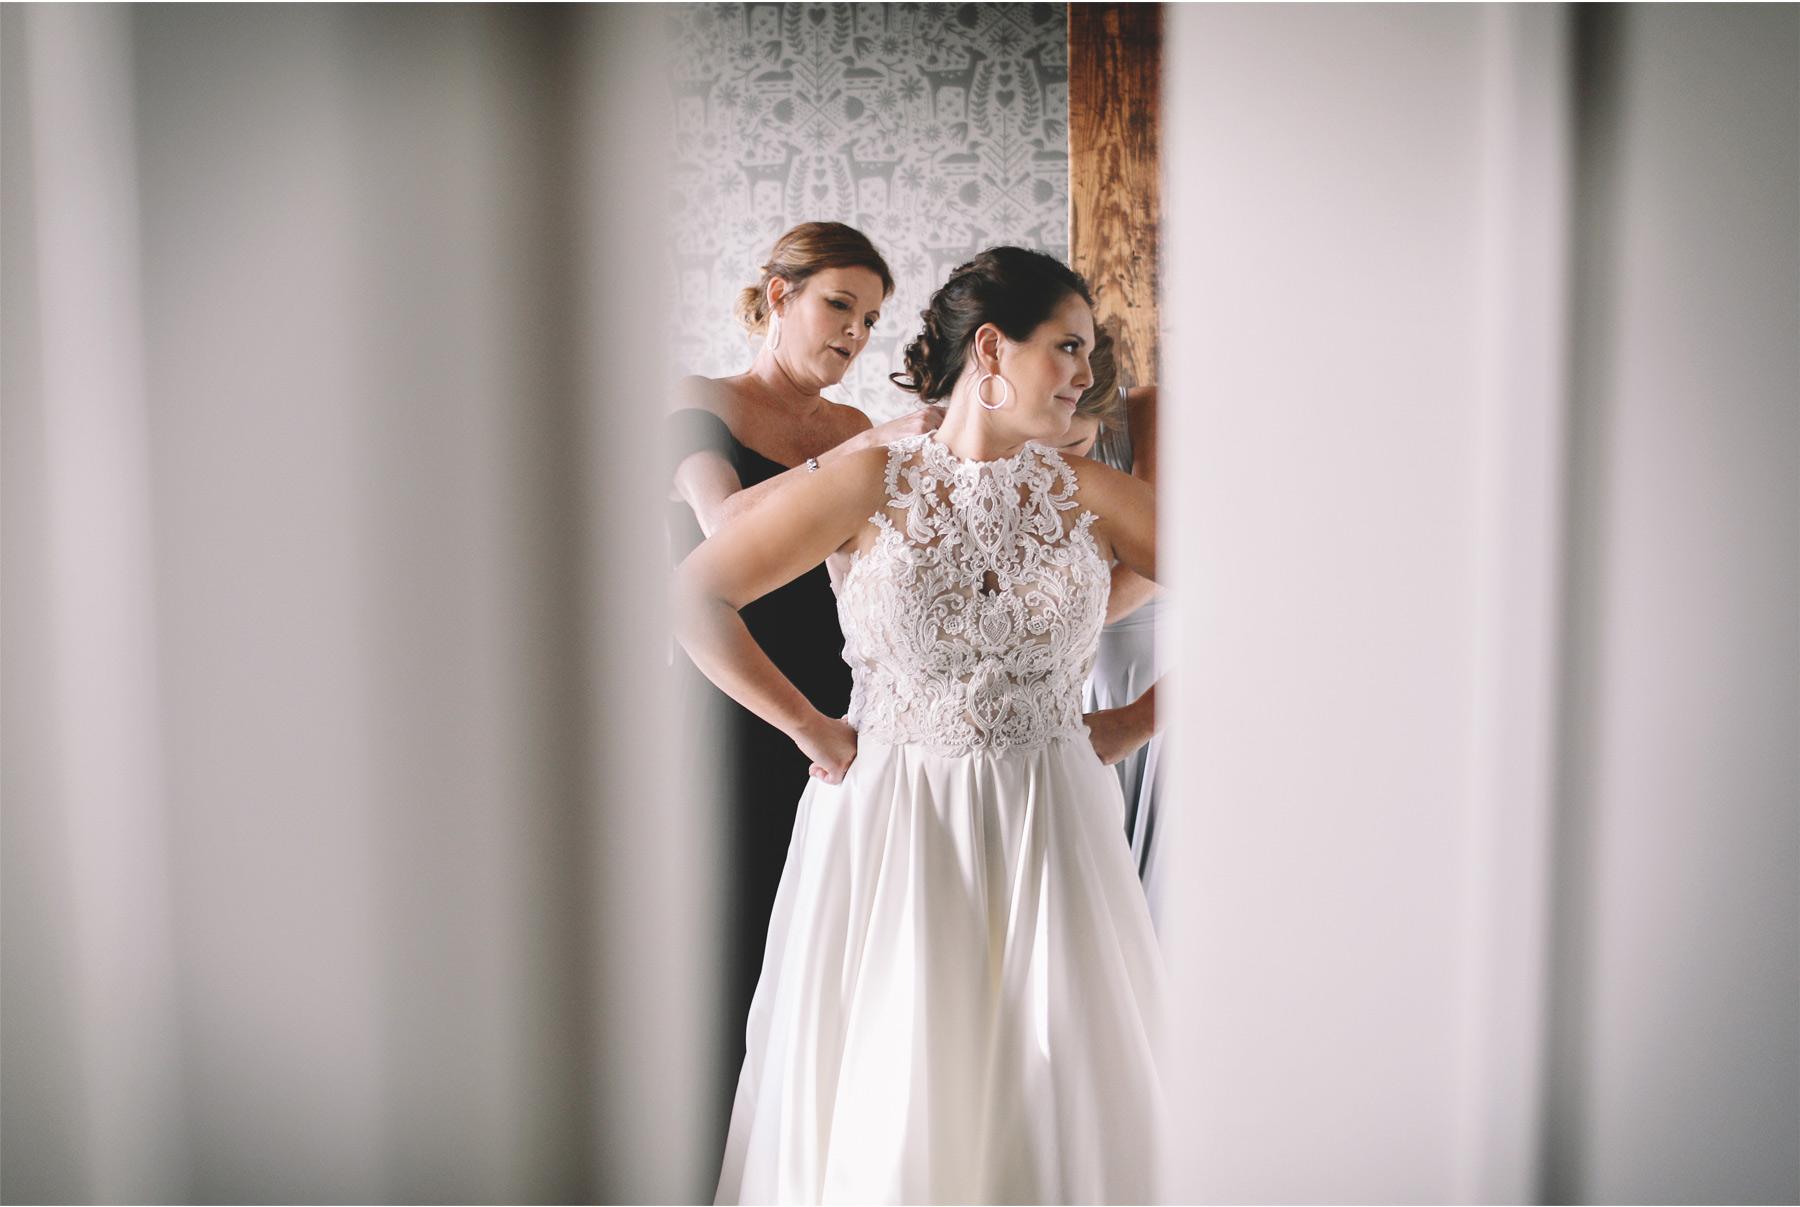 03-Minneapolis-Minnesota-Wedding-Photographer-Vick-Photography-Wedding-Morning-Dress-Carrie-and-August.jpg